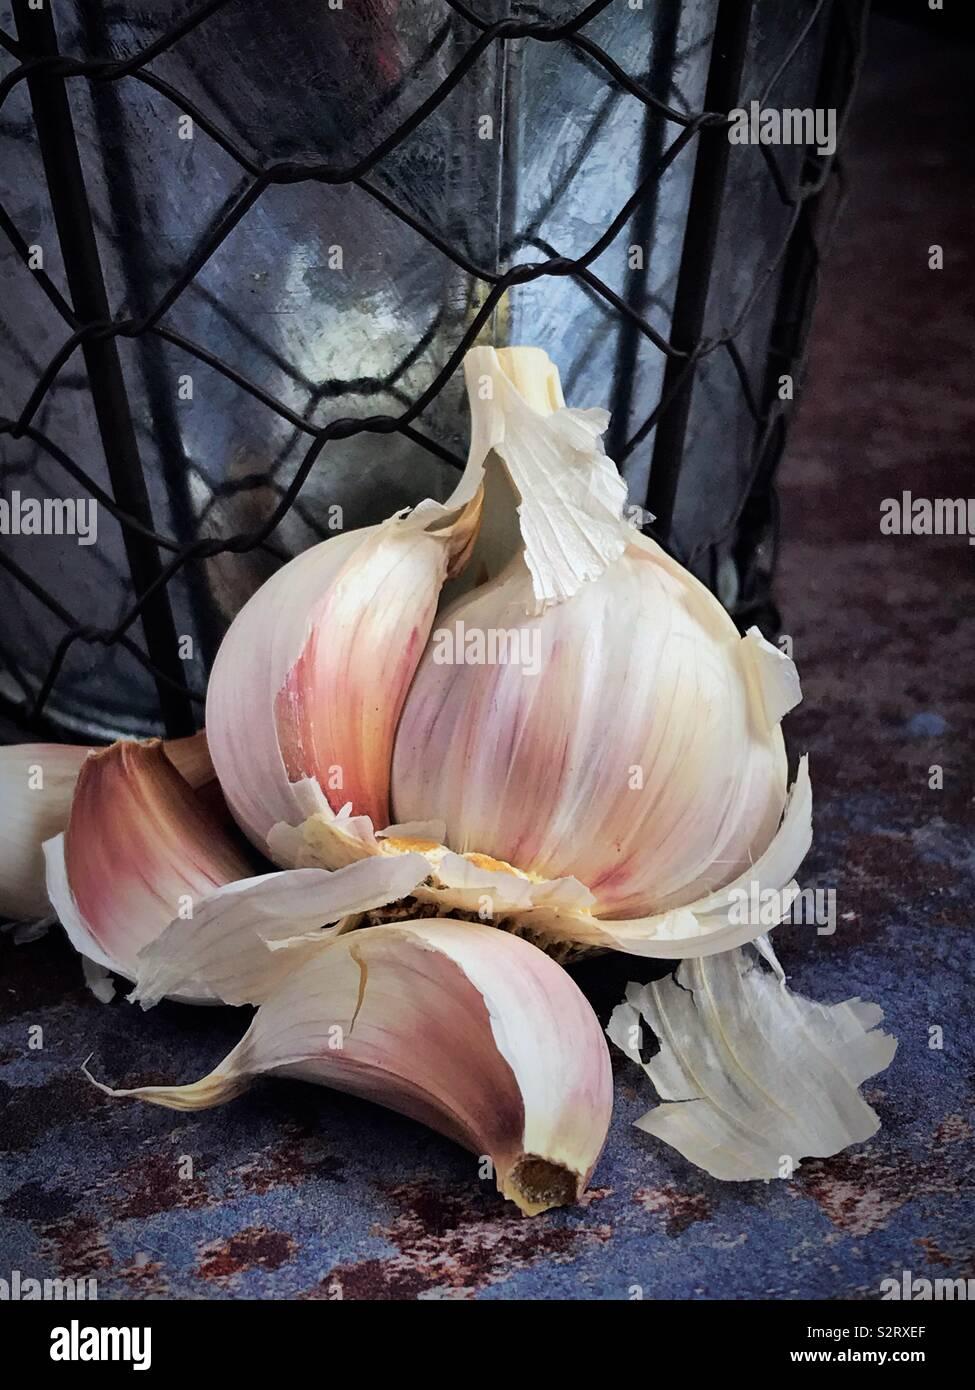 Garlic bulb broken open against a vintage metal pot. - Stock Image